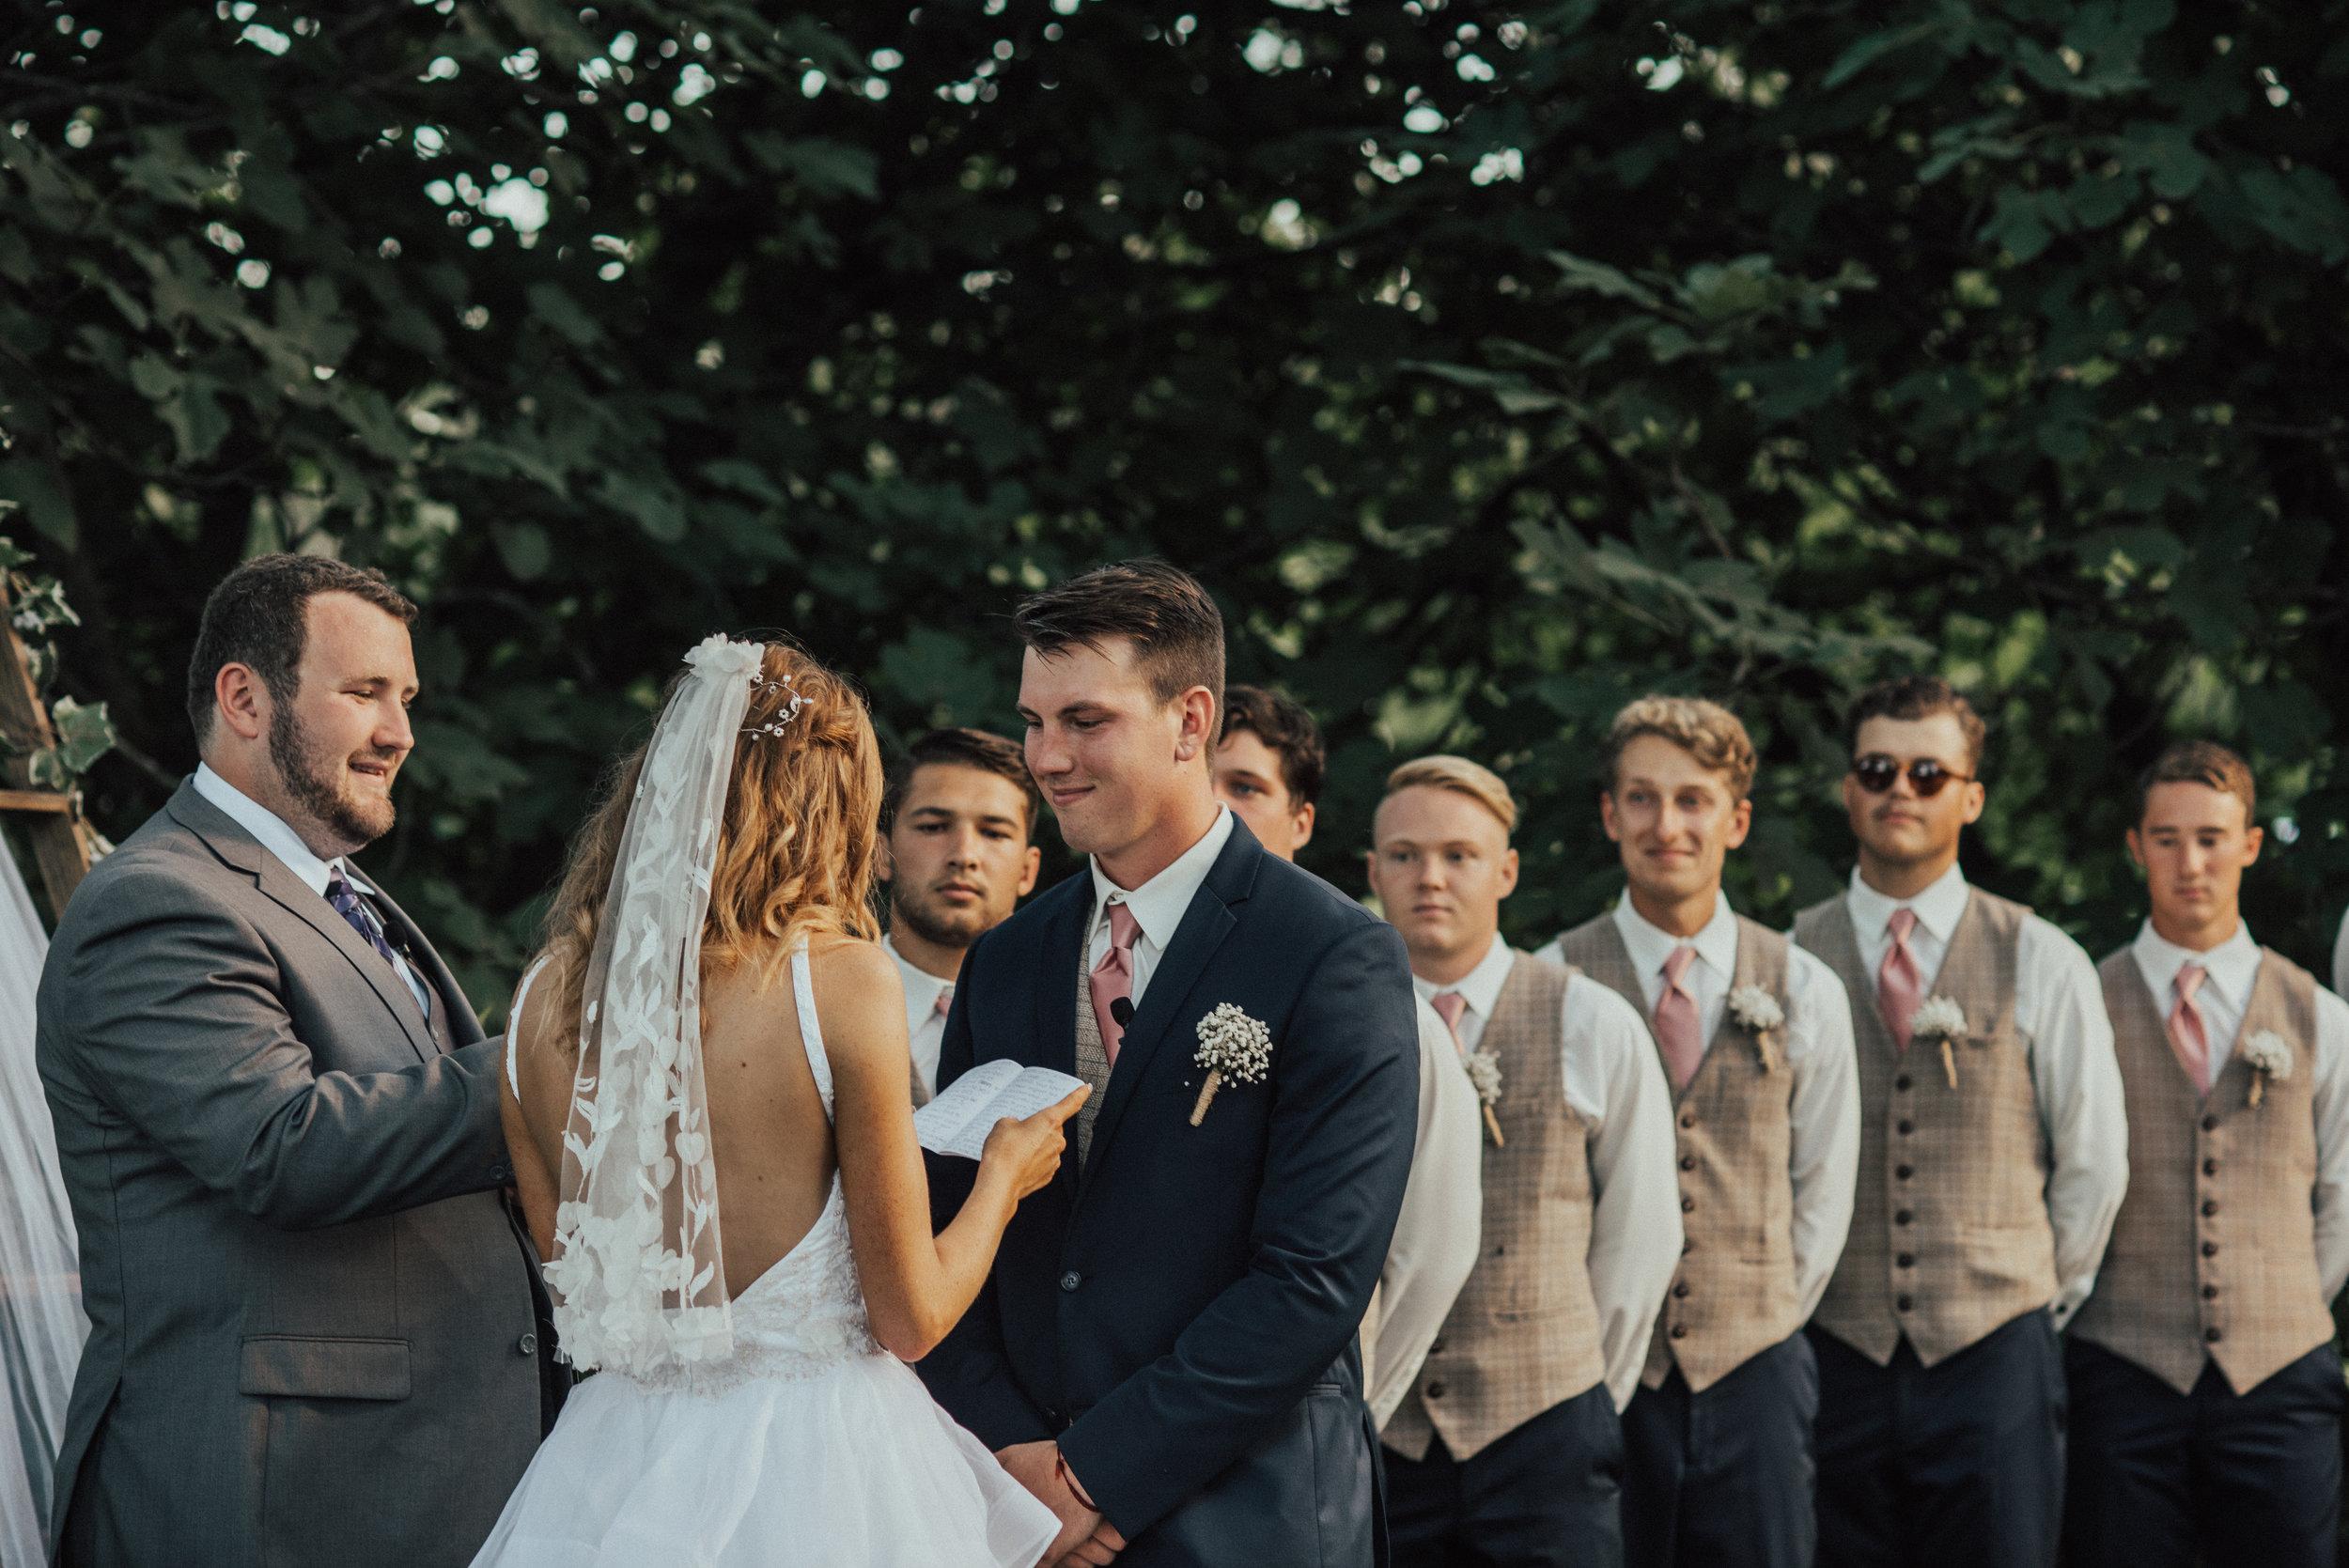 Knotts Island, NC Wedding by SB Photographs_-14.jpg